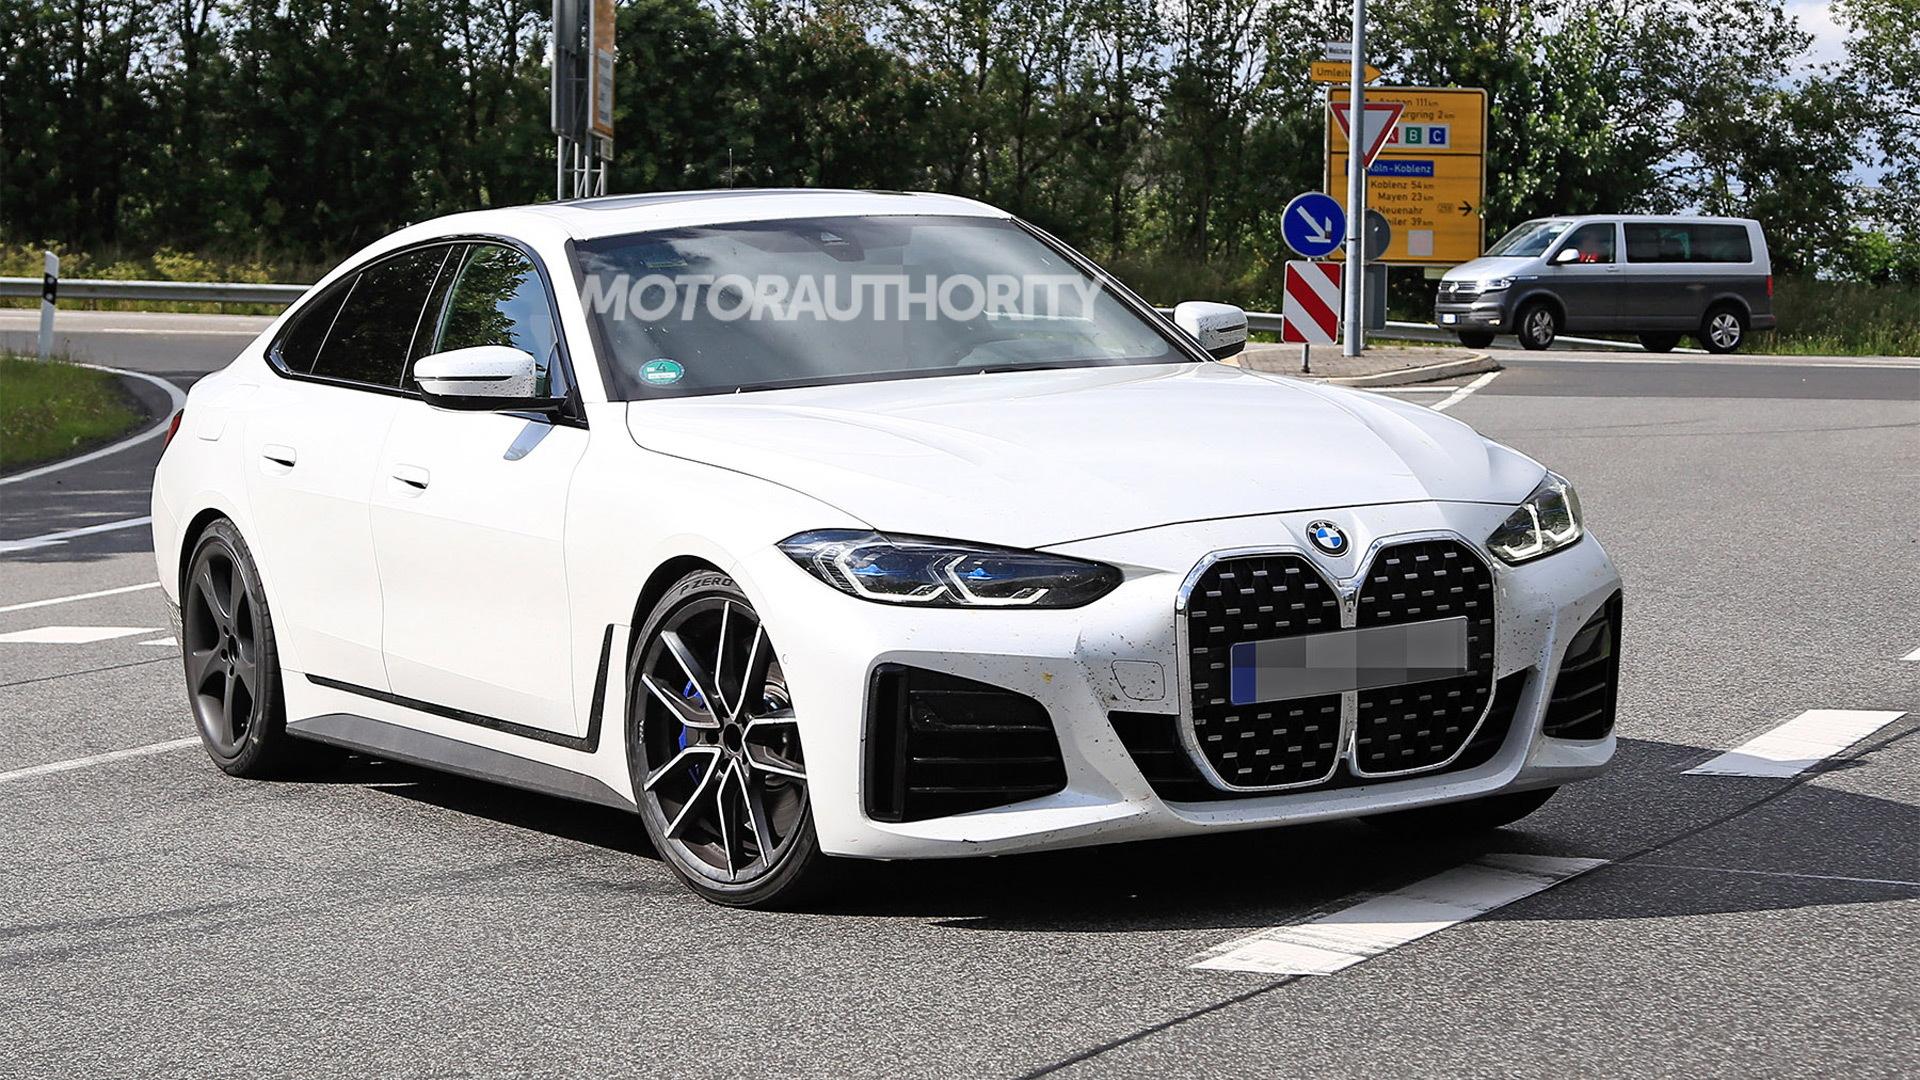 2023 BMW Alpina B4 Gran Coupe spy shots - Photo credit:S. Baldauf/SB-Medien